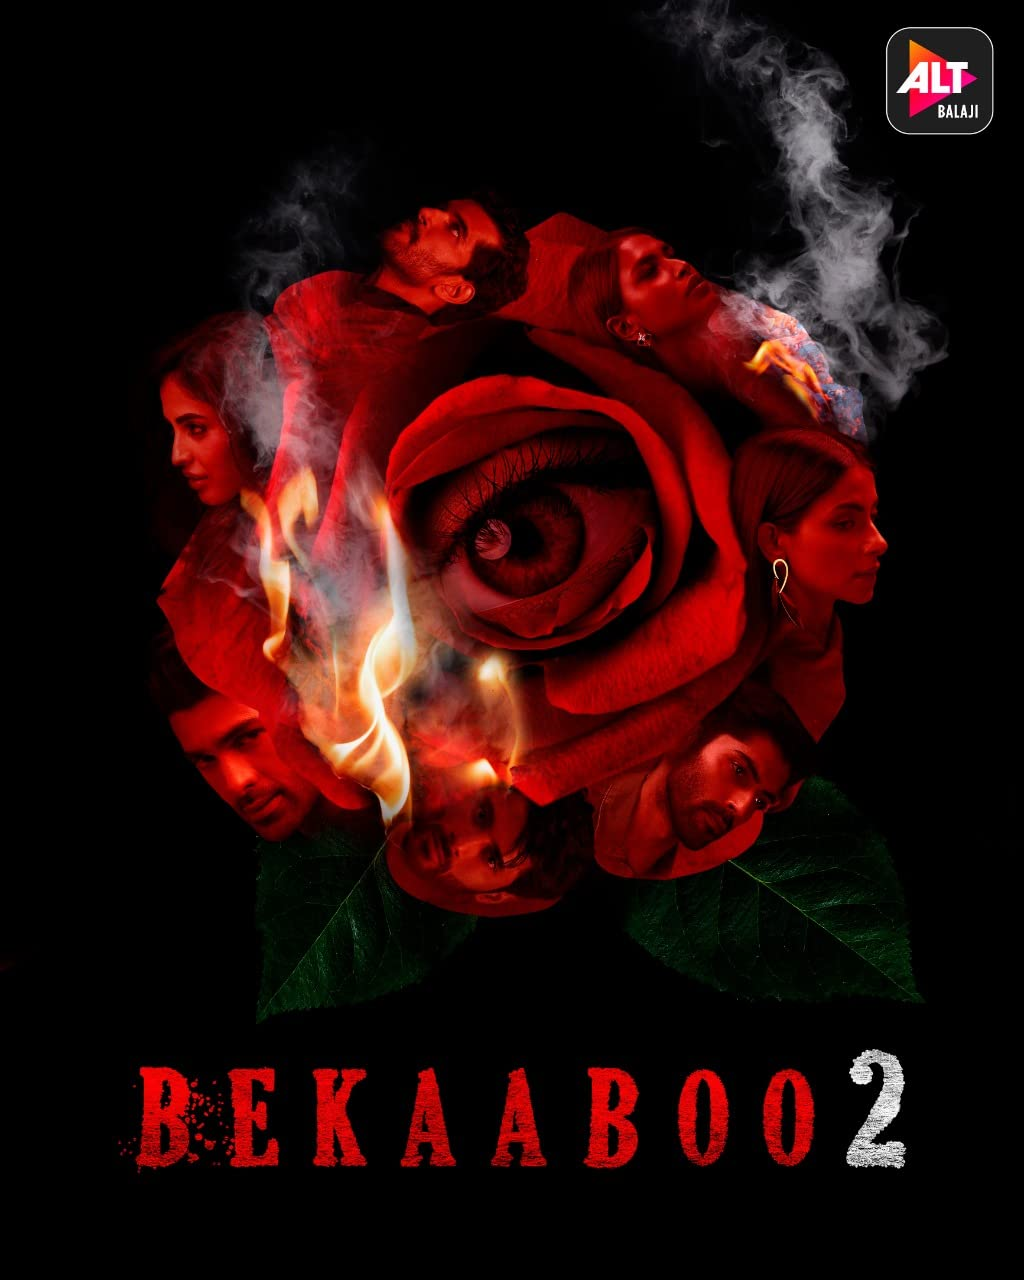 Bekaaboo (2021) Hindi Season 2 Complete AltBalaji Web Series Download